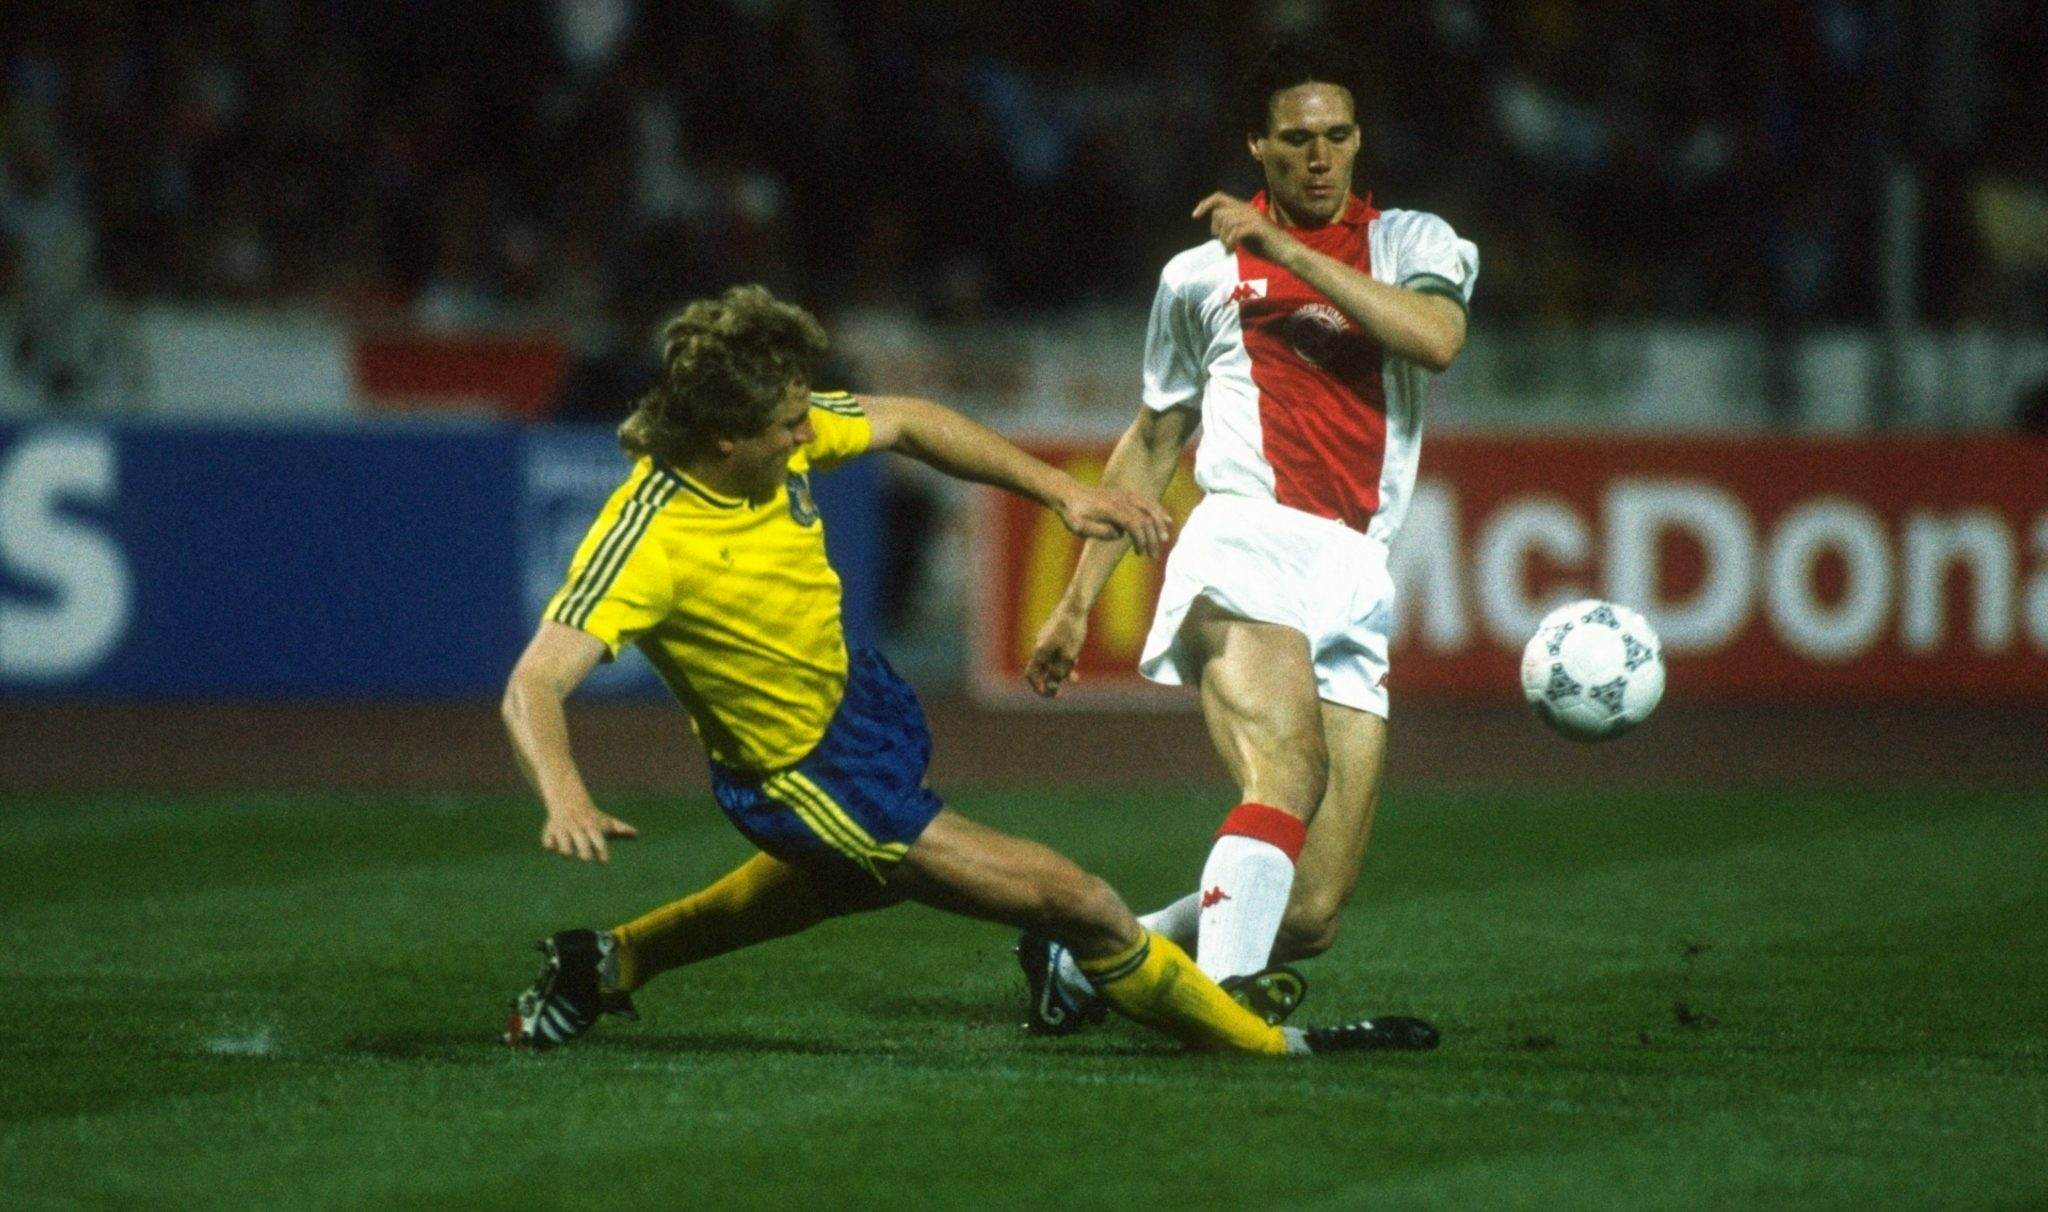 Marco Van Basten at Ajax thrashed.